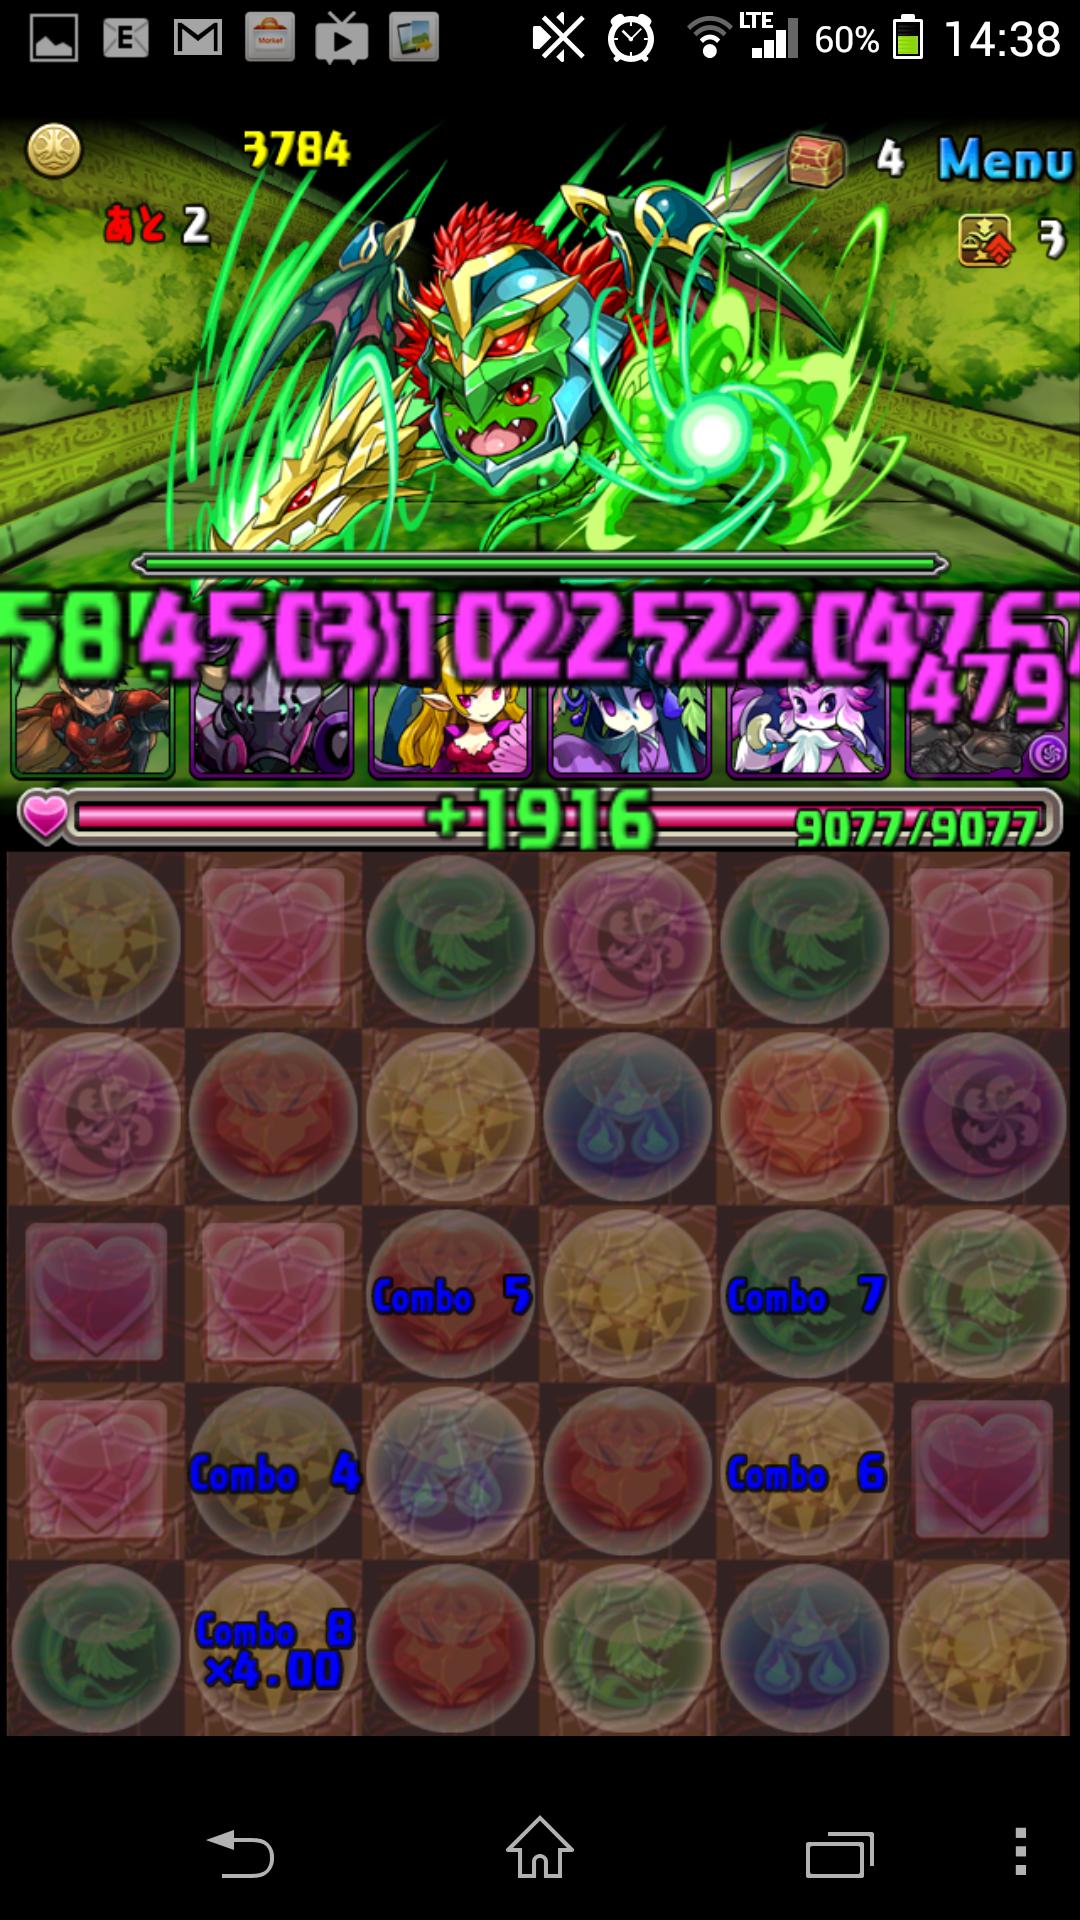 Screenshot_2014-04-01-14-38-04.png